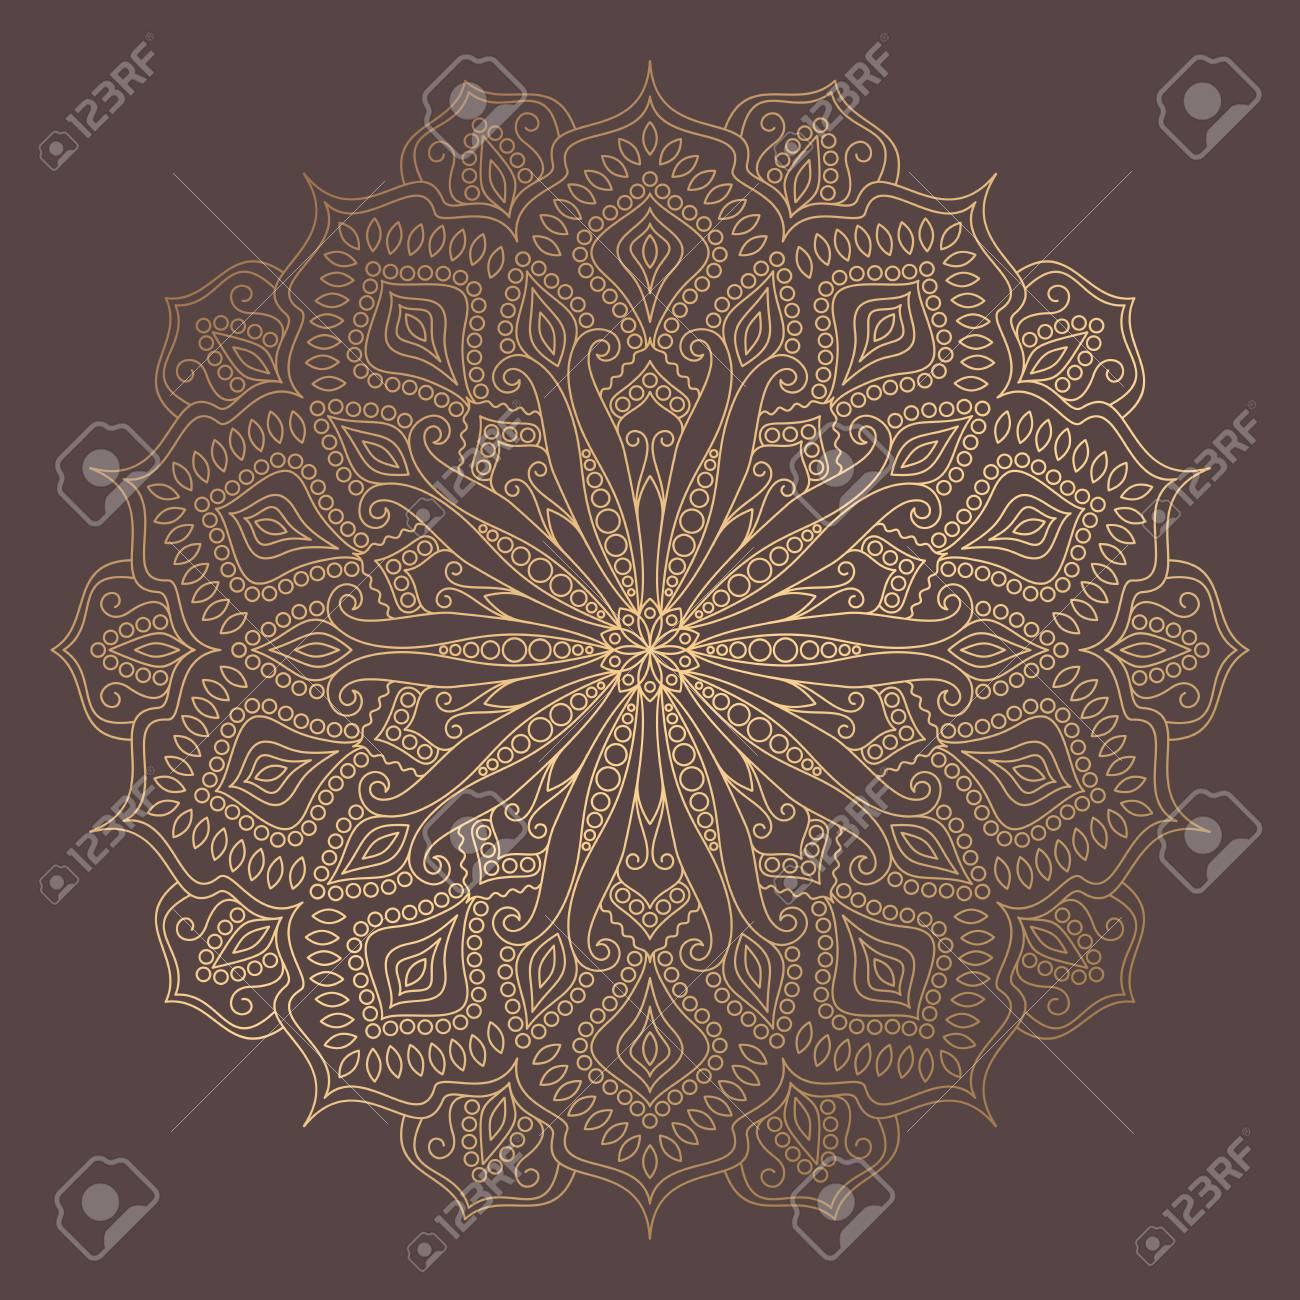 Mandala Vector Design Element - 99177649